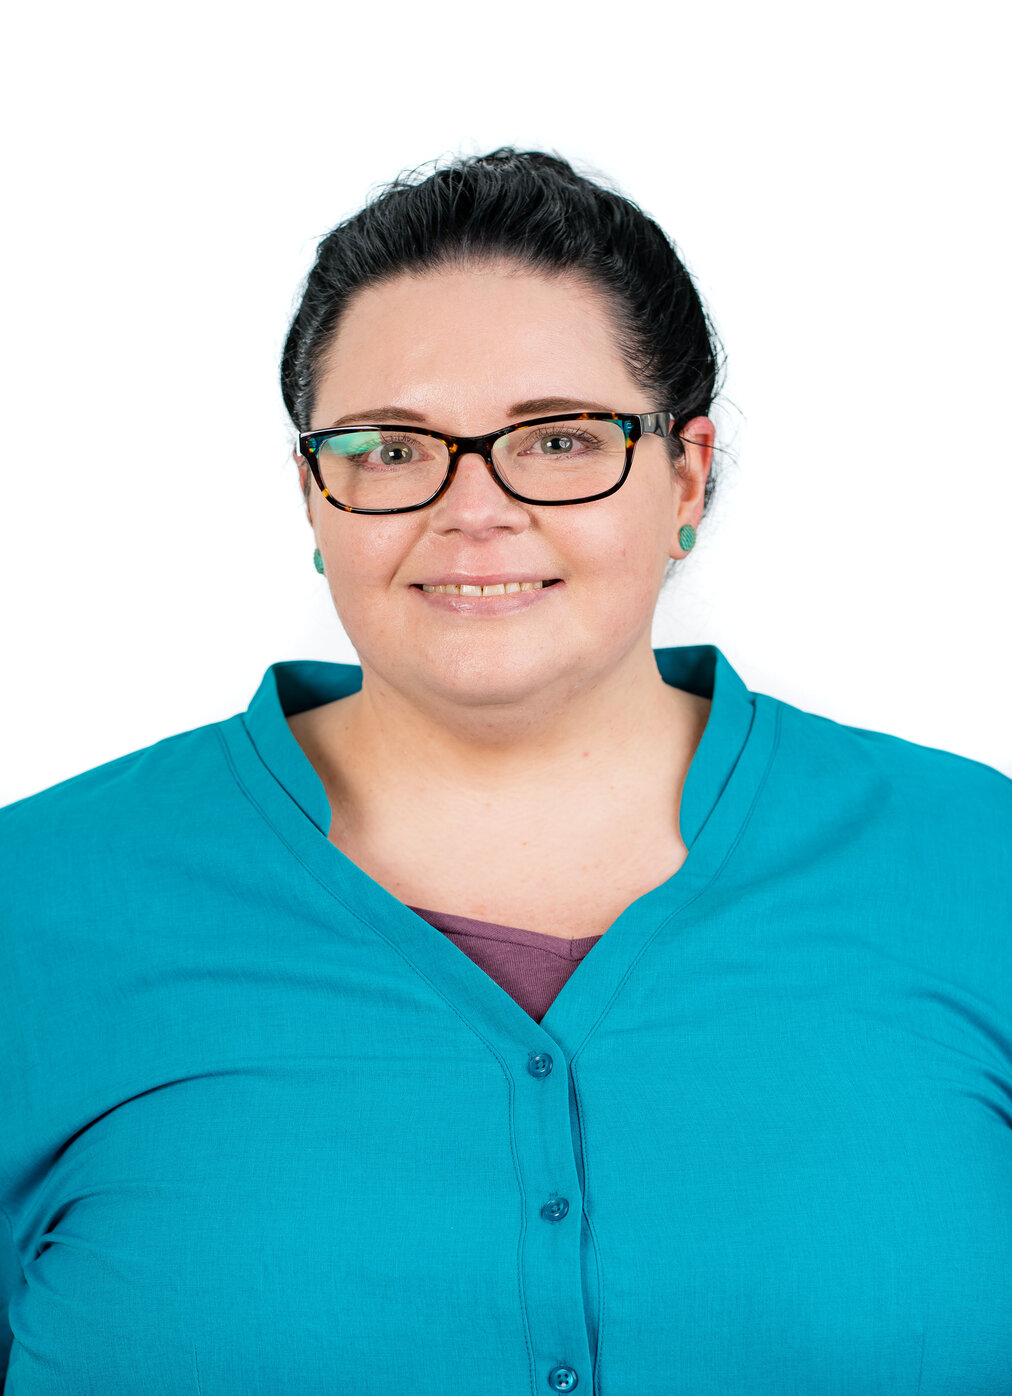 Terri Bailey profile image.